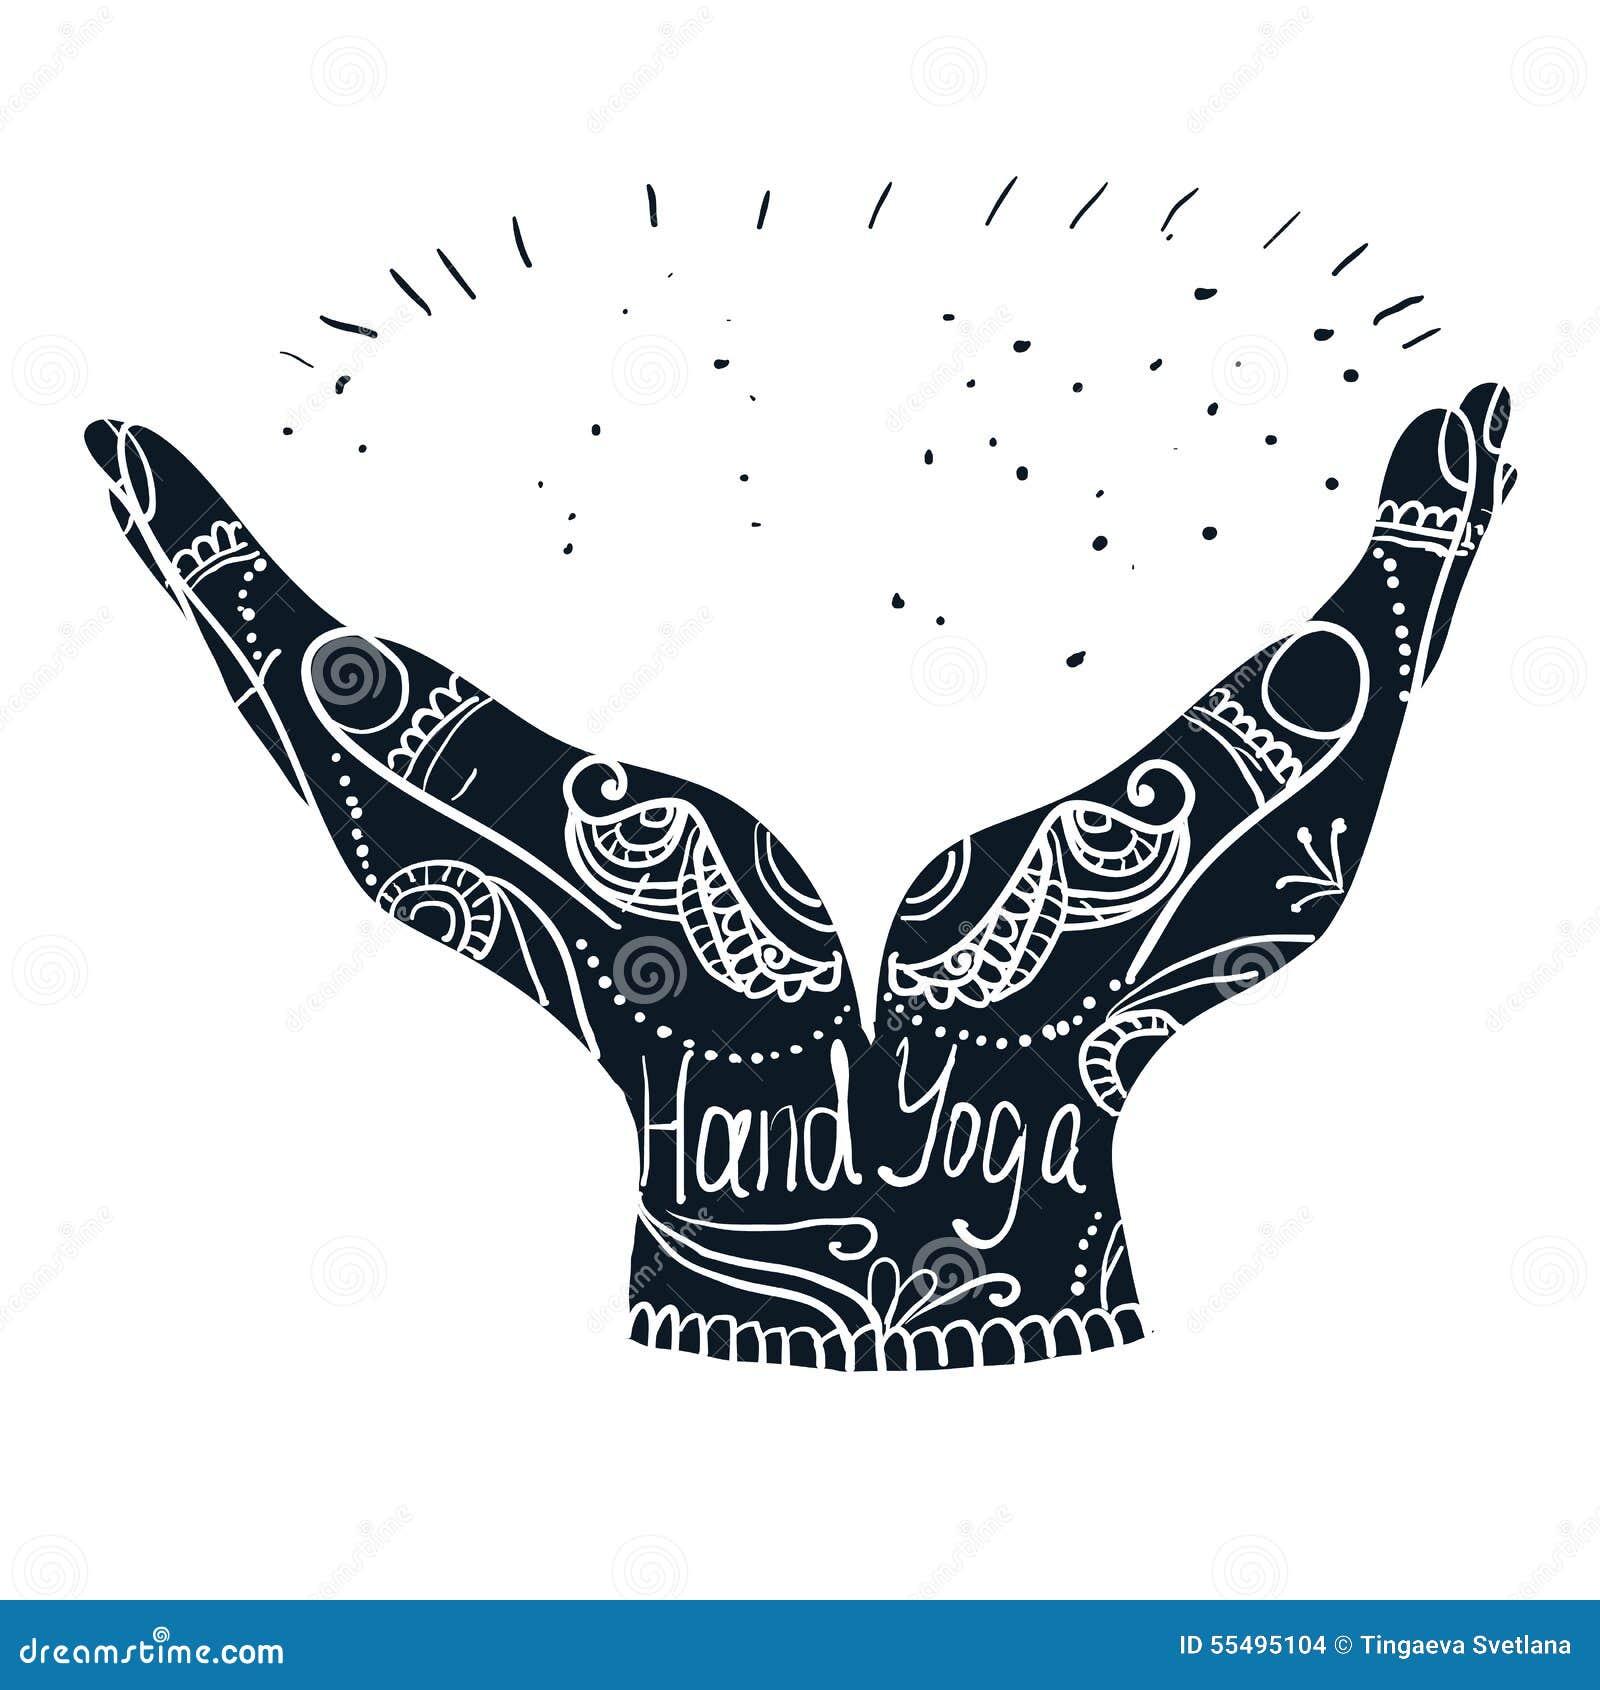 Mehndi Hands Clipart : Element yoga mudra hands with mehndi patterns stock